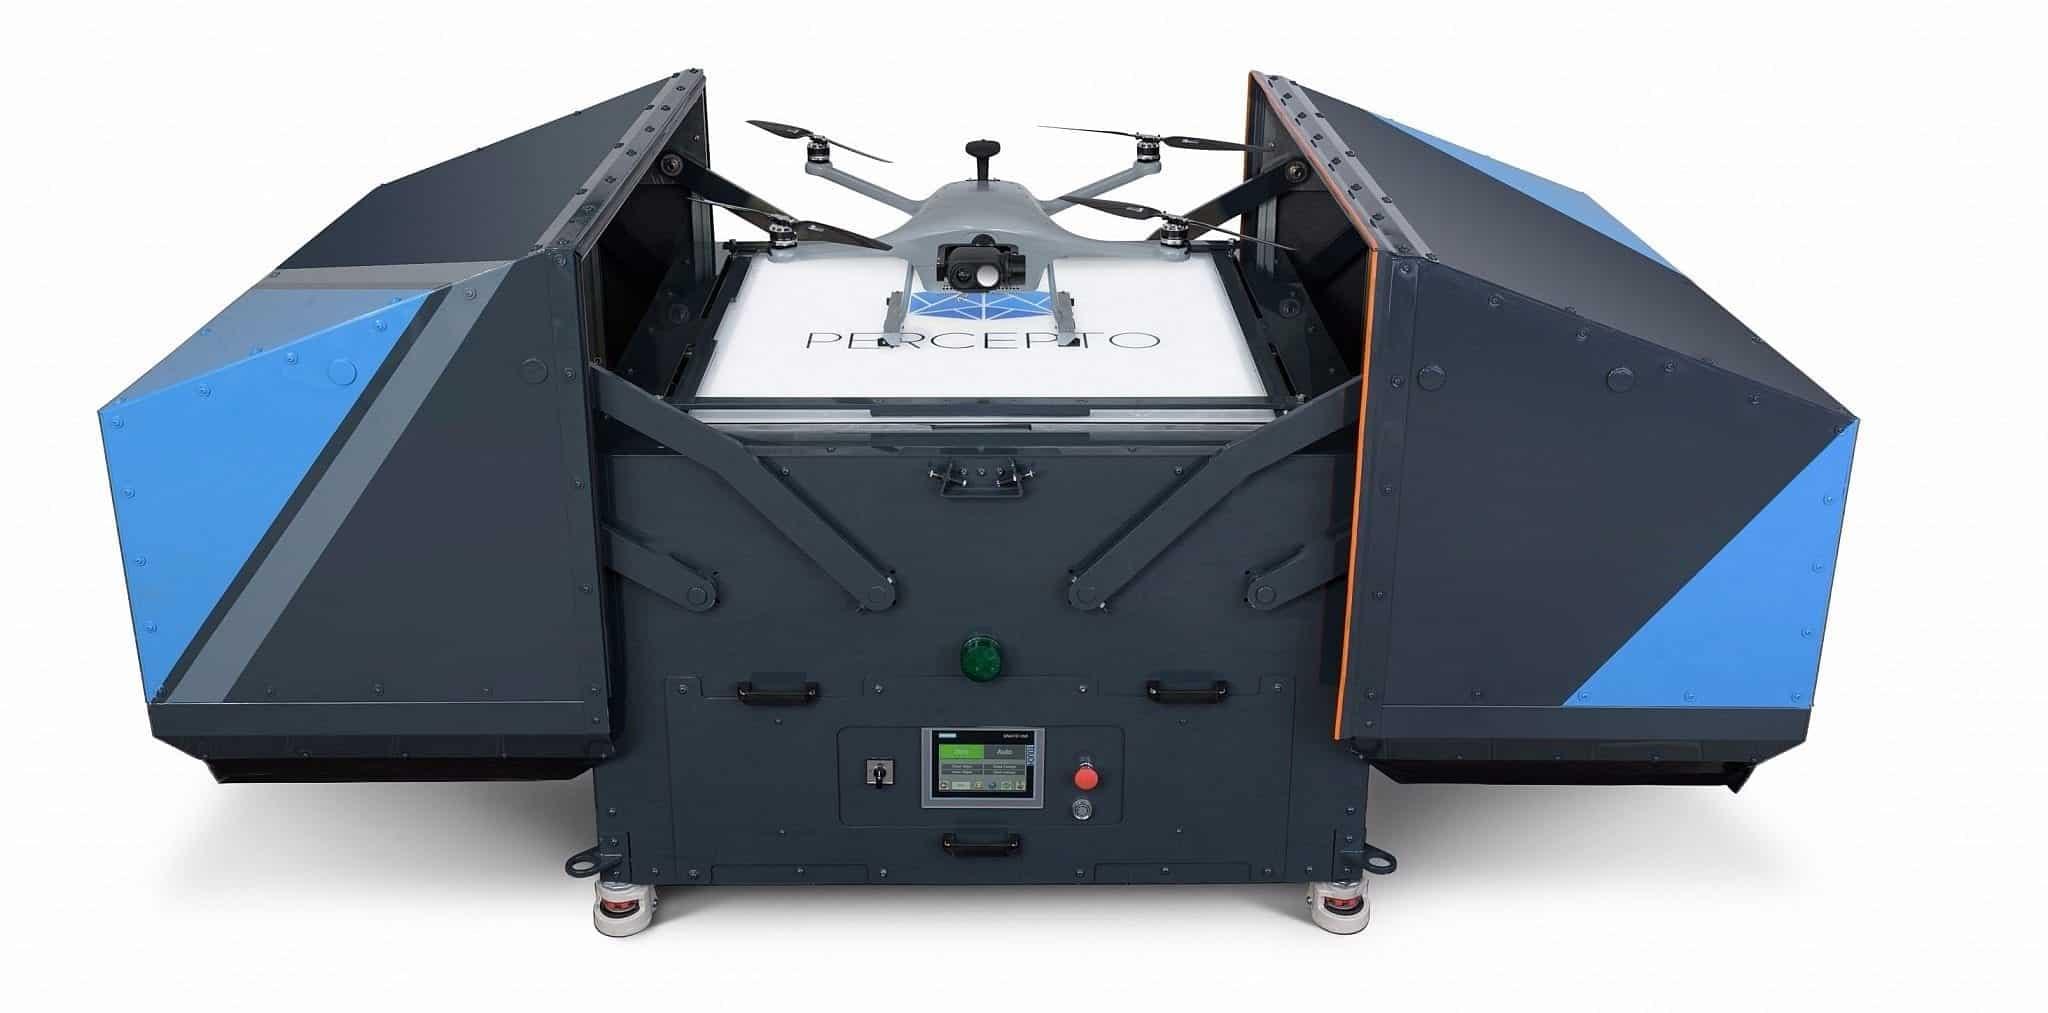 Percepto Sparrow drone